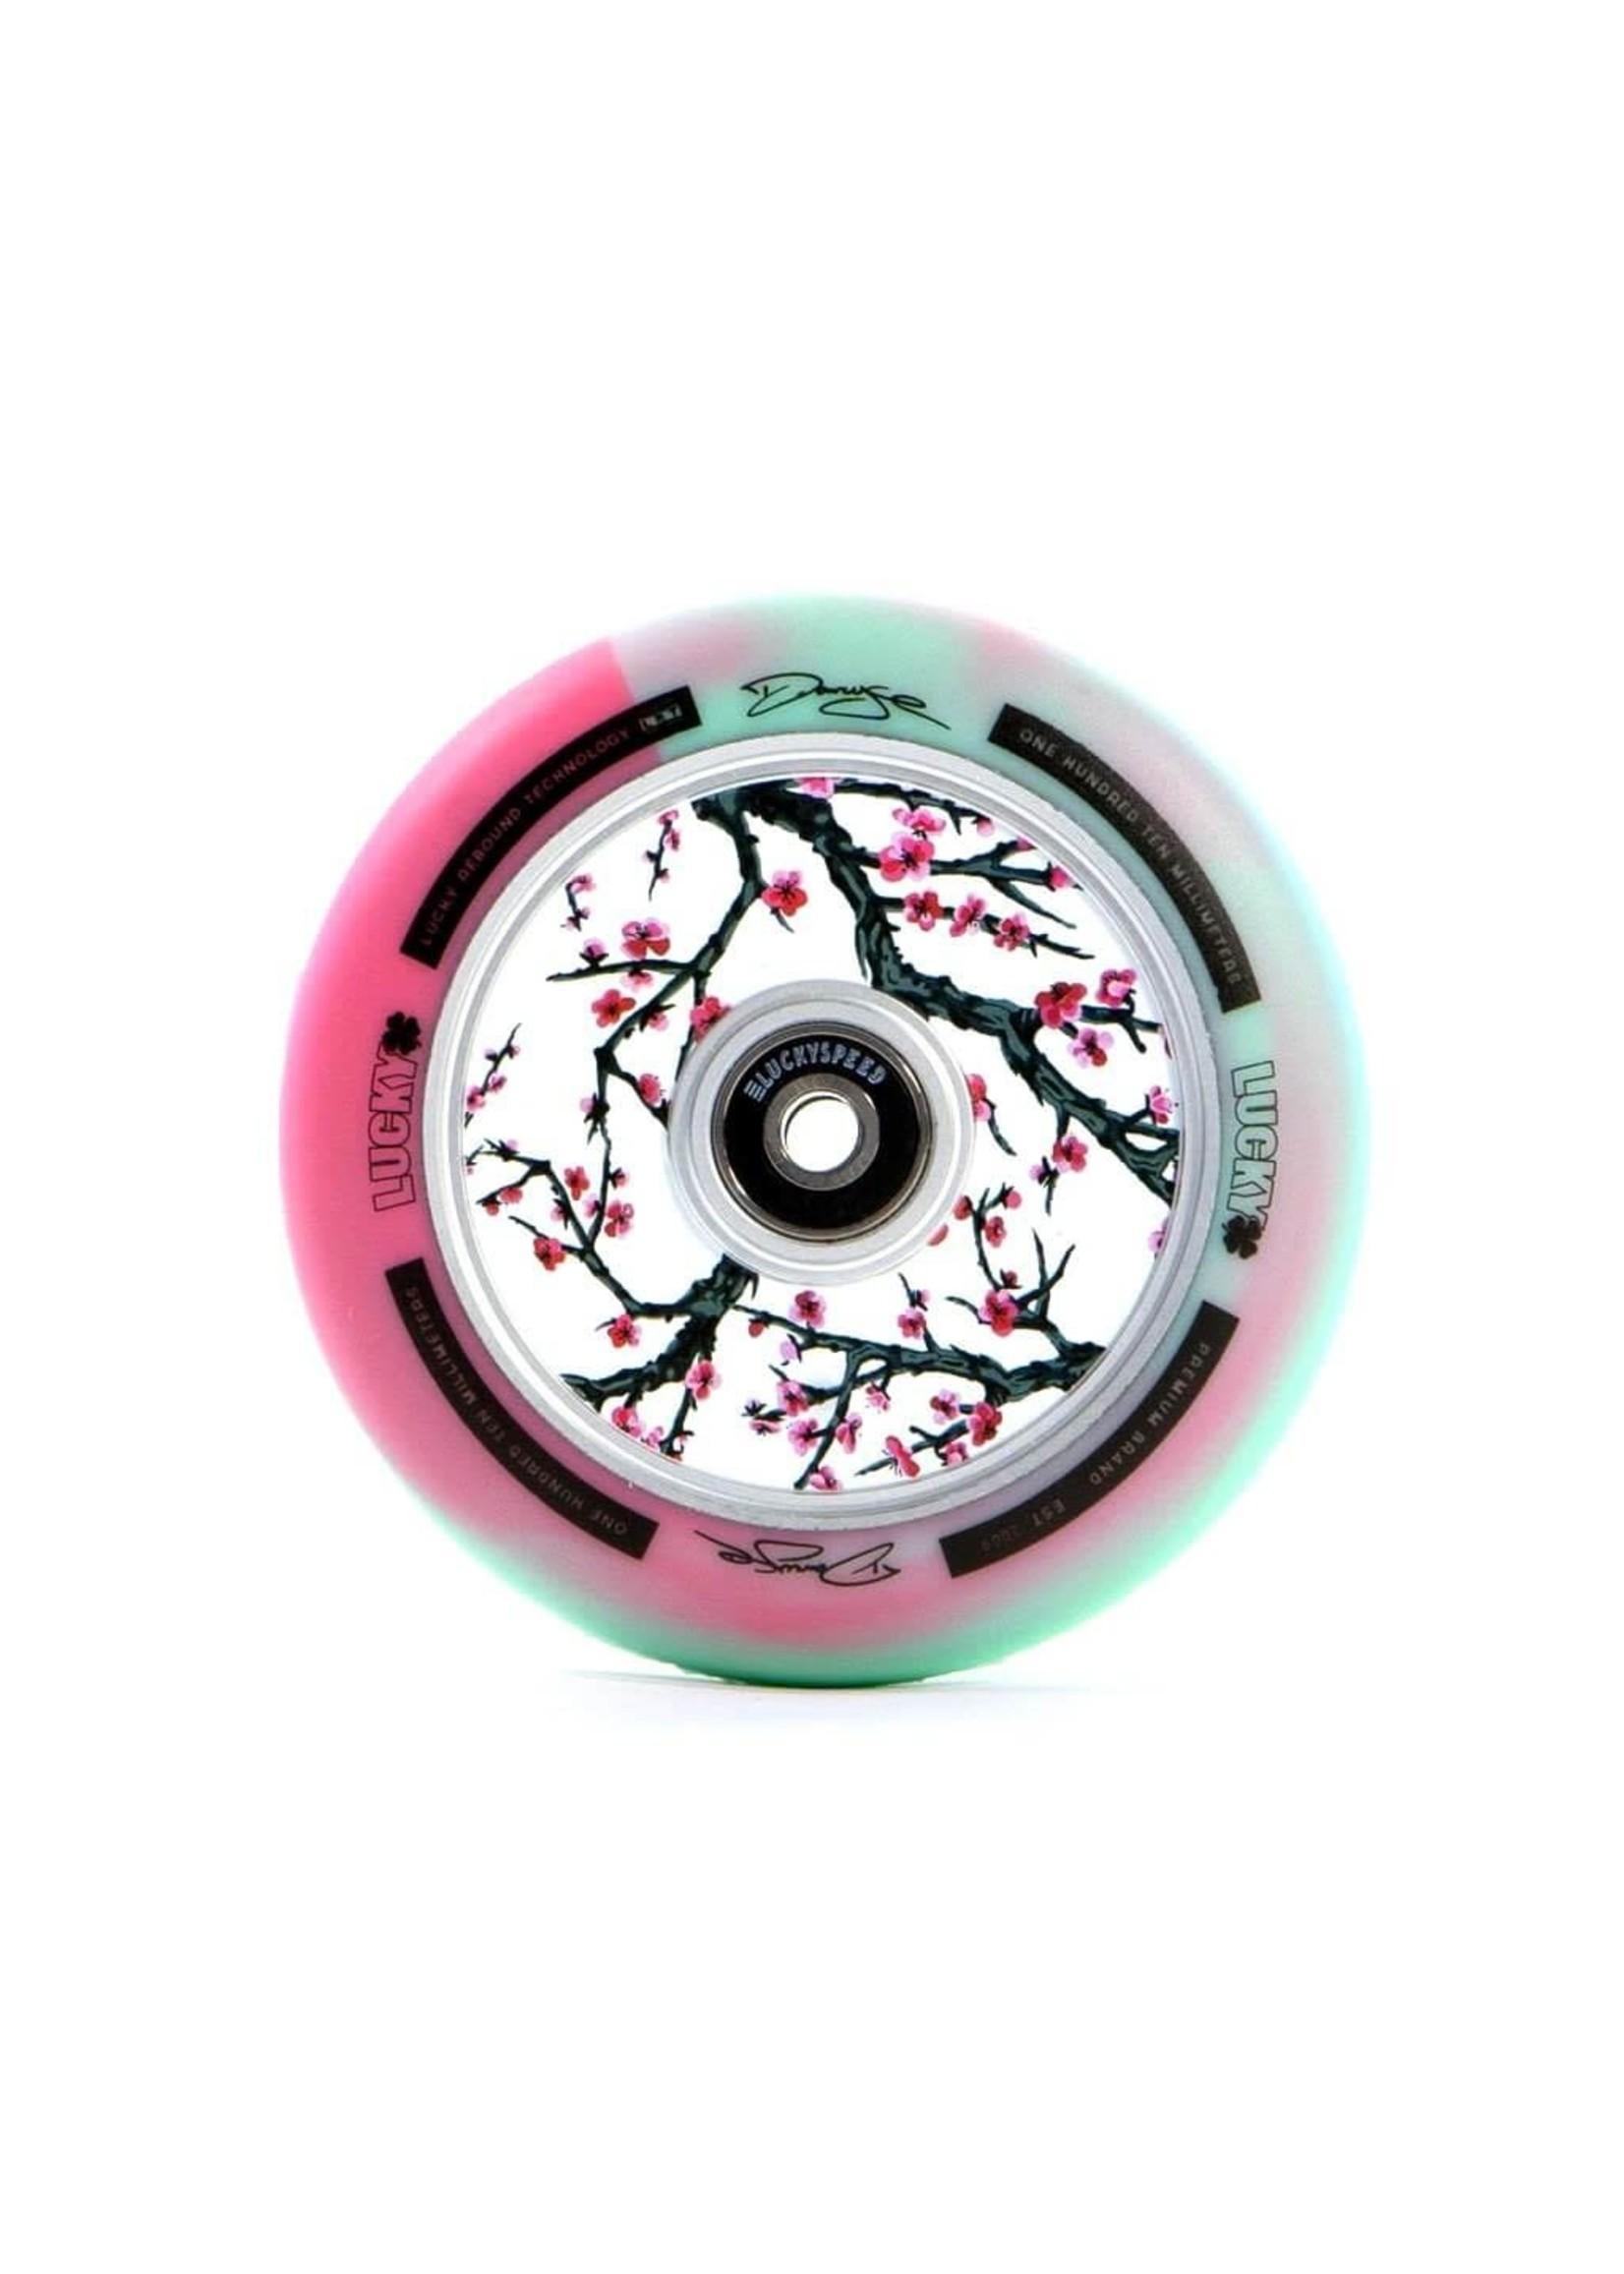 Lucky Lucky - Lunar Wheels - Darcy Cherry Evans sig.